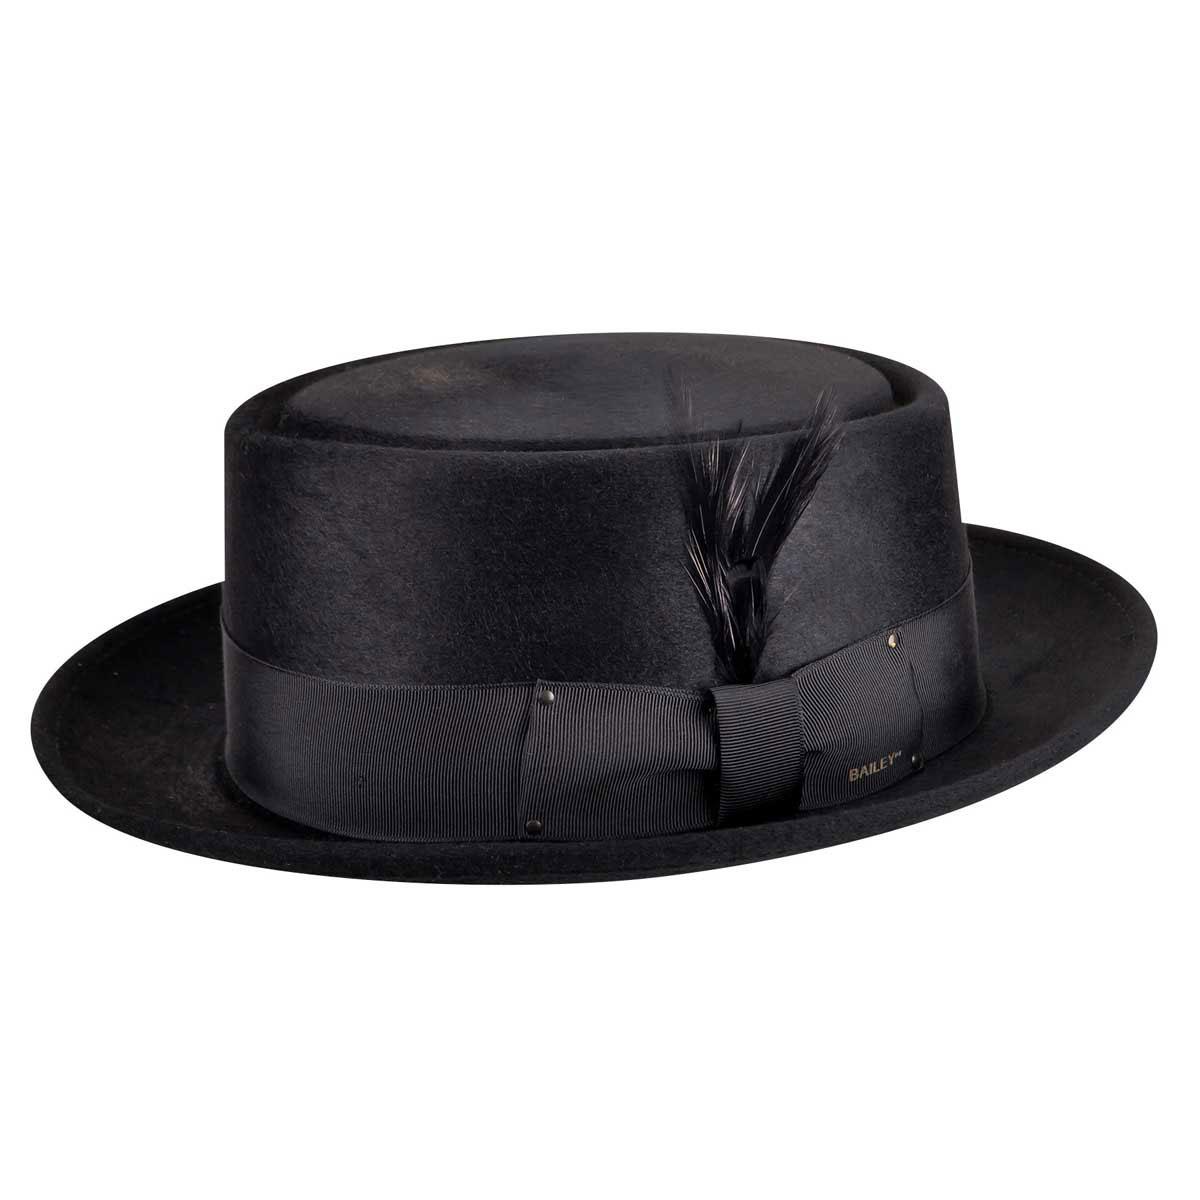 Bailey of Hollywood Jett Pork Pie Hat in Black